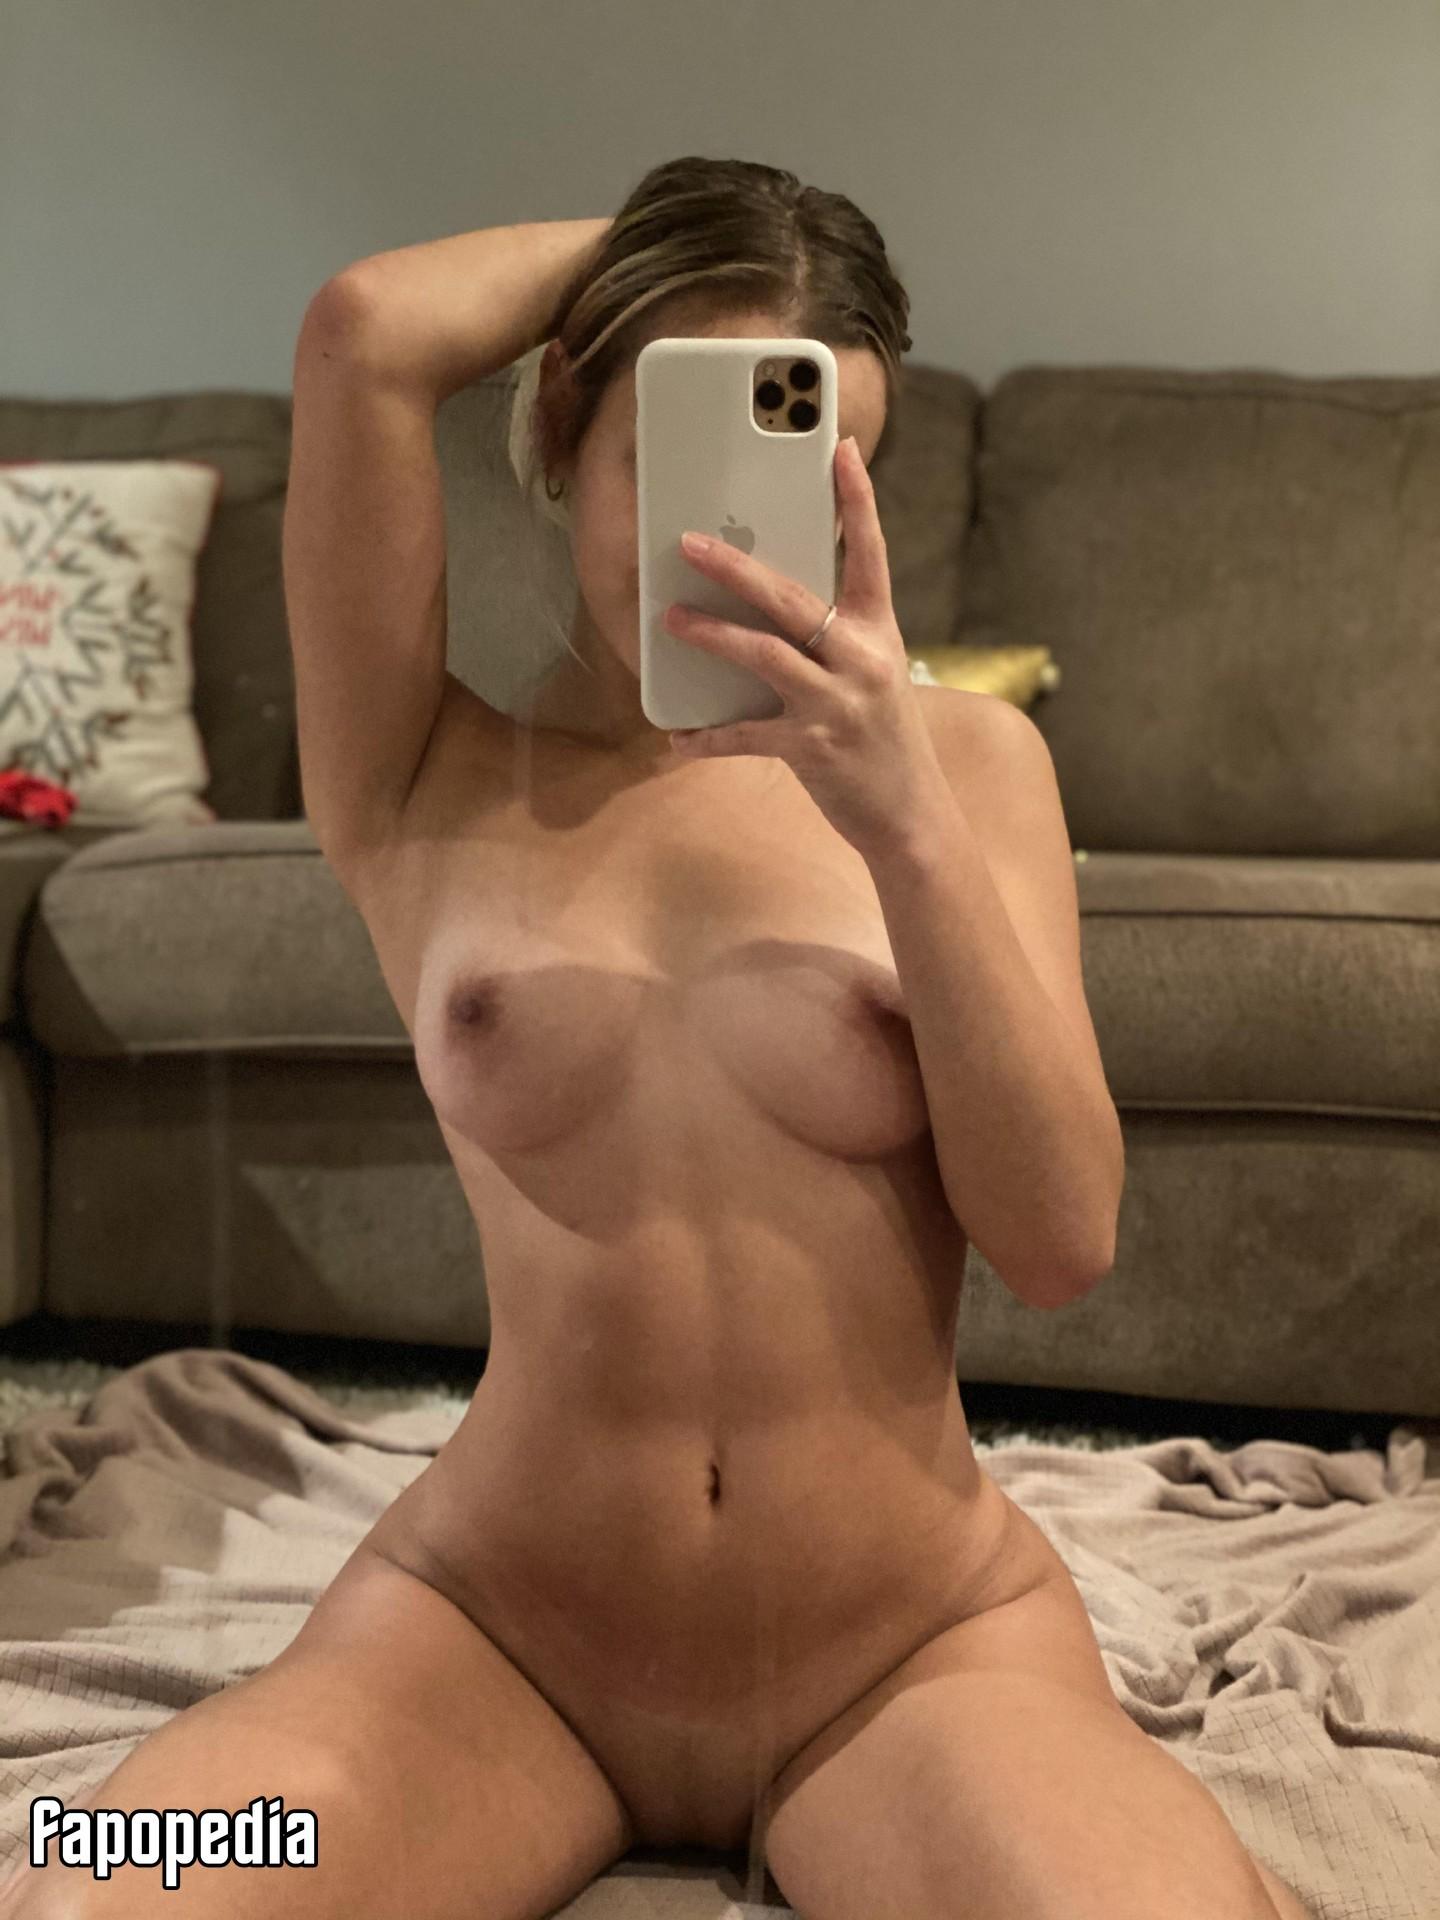 Hotrod99xxx Nude Leaks